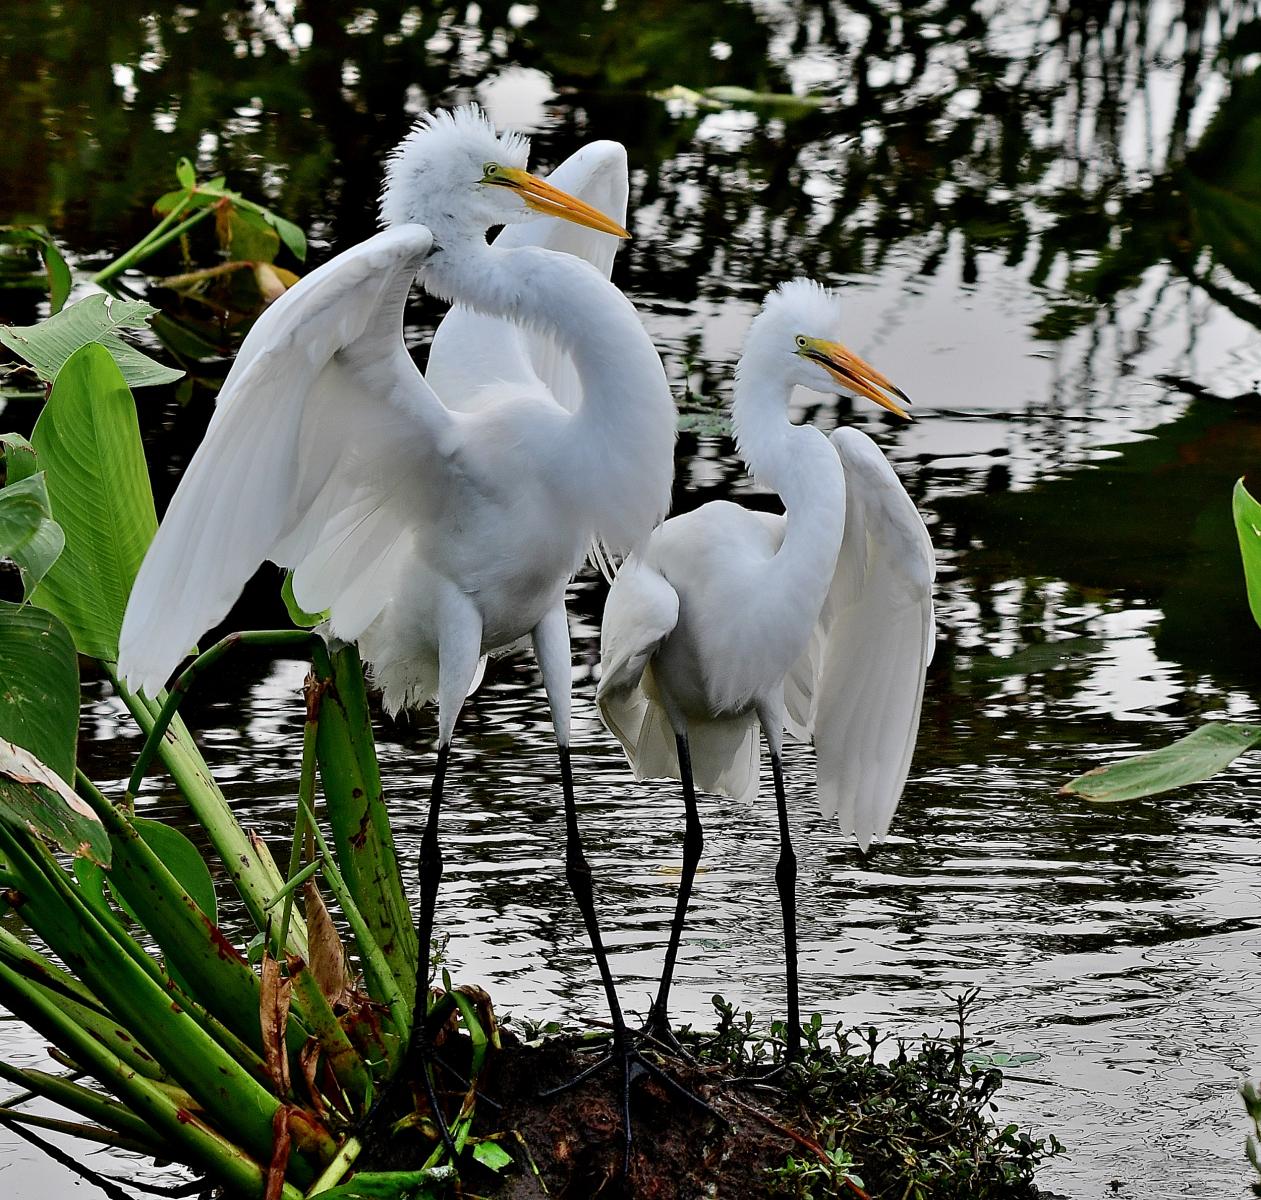 Juvenile Great Egrets by Marilynne Strazzeri